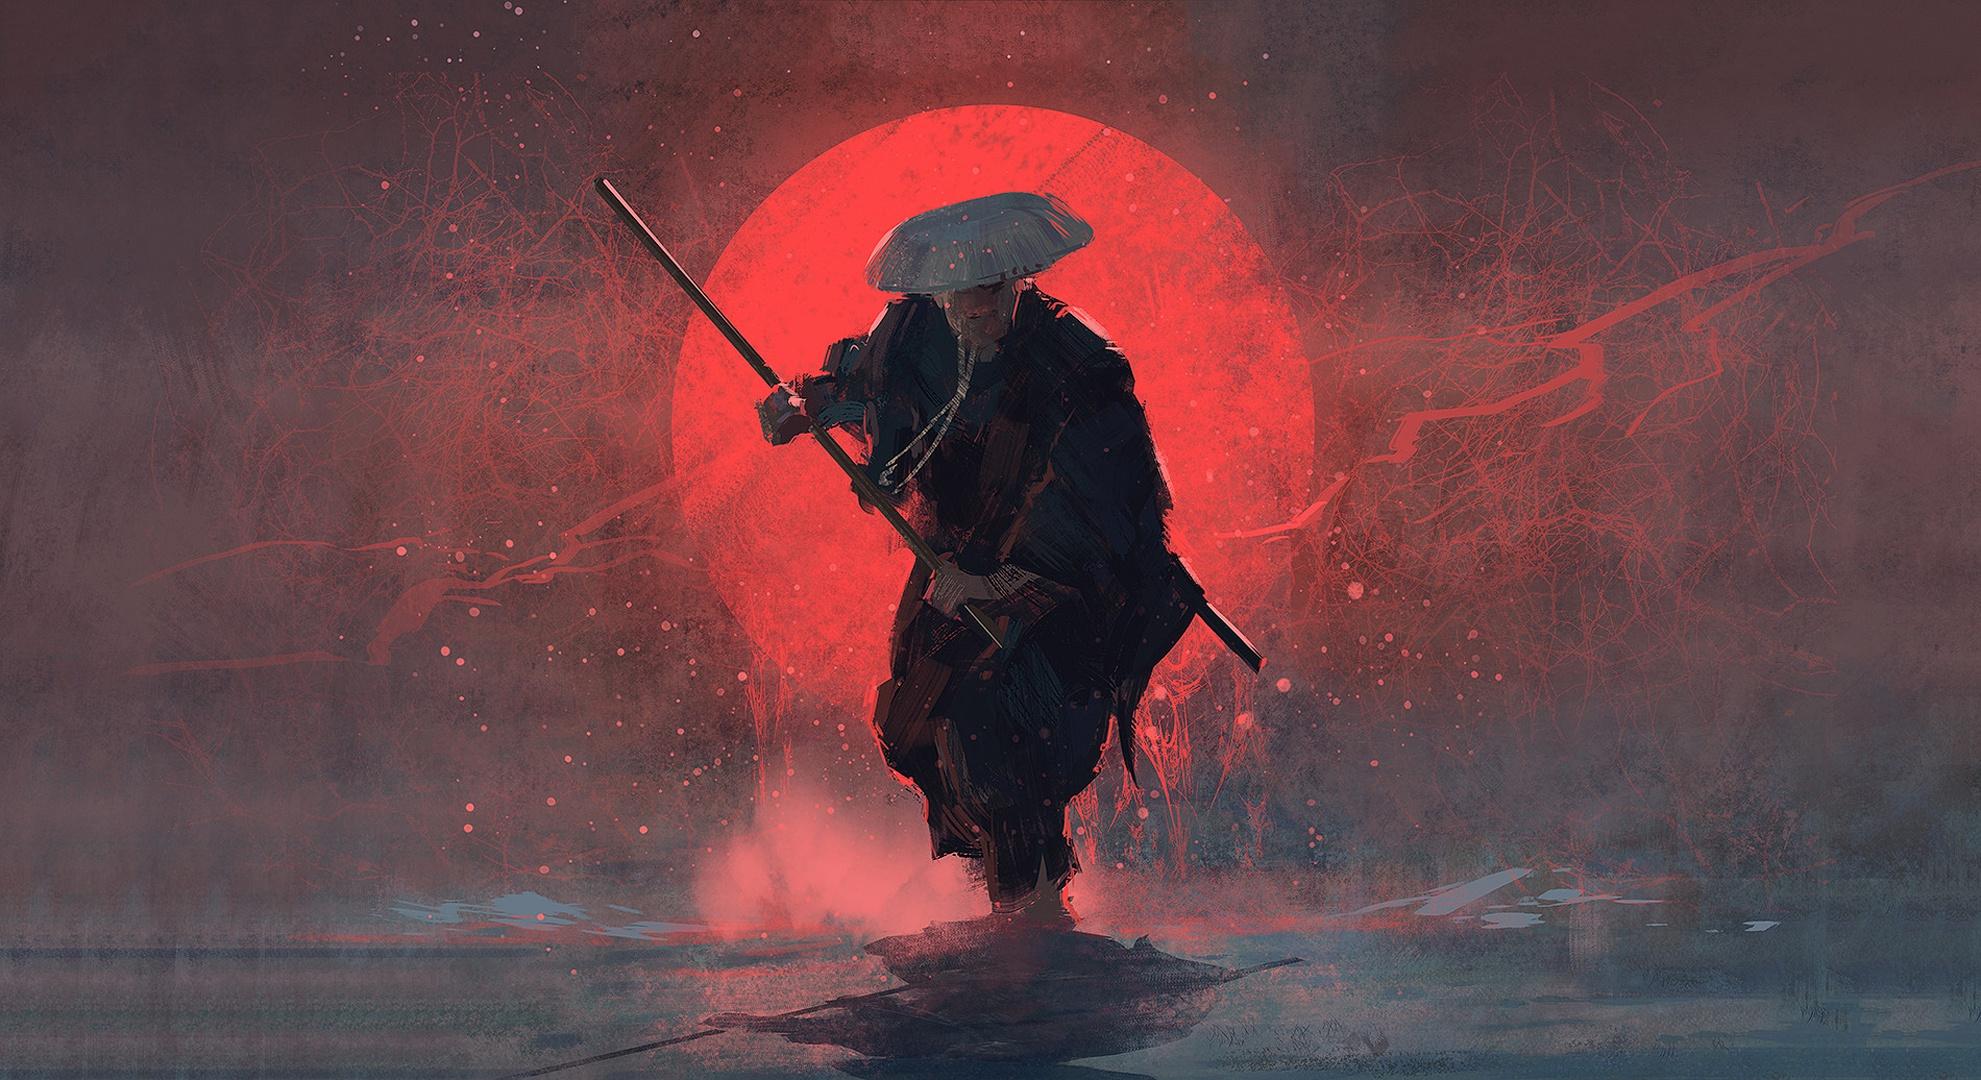 Samurai HD Wallpaper | Background Image | 1981x1080 | ID ...